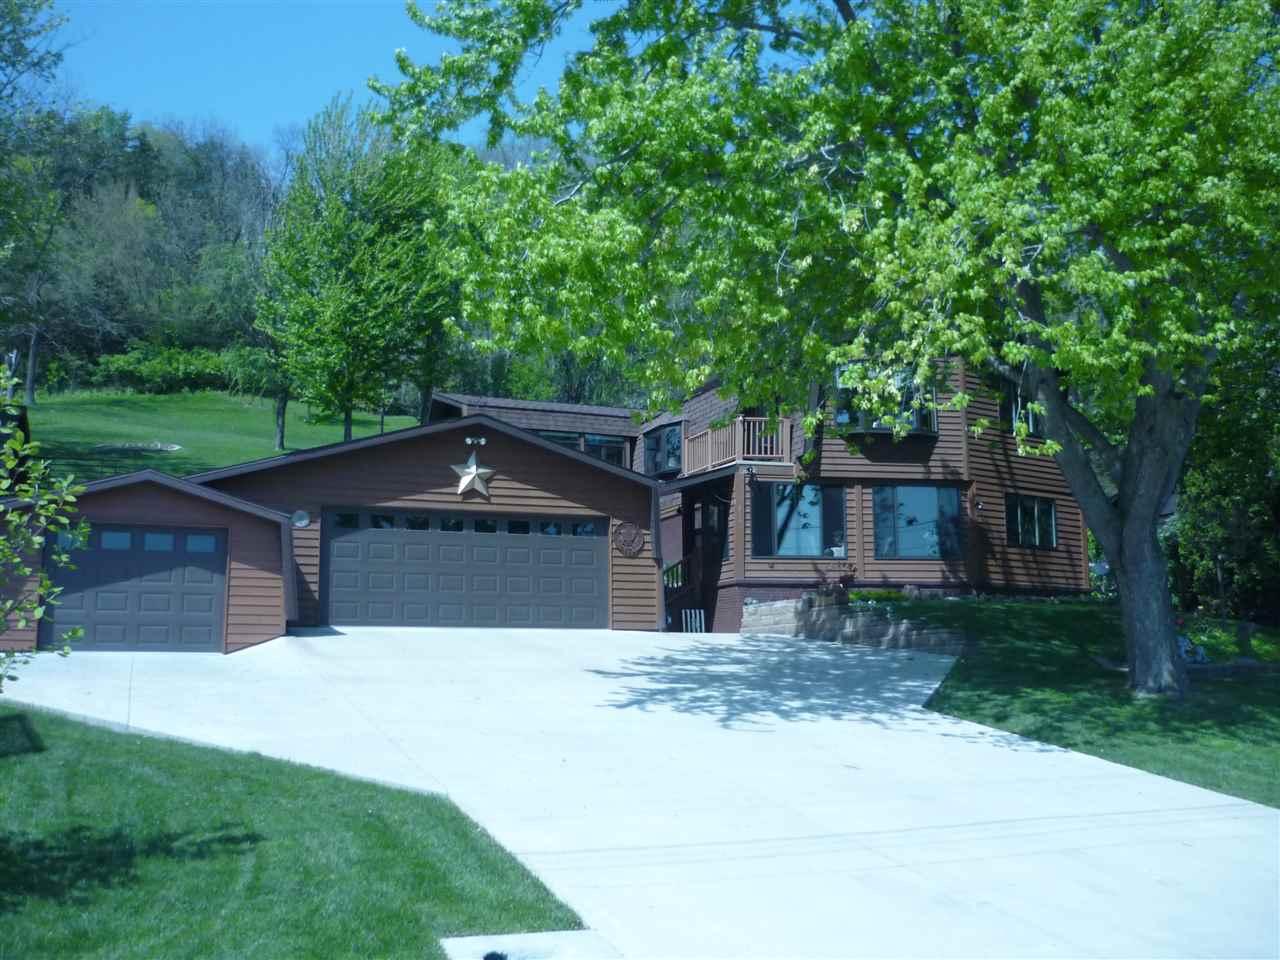 Real Estate for Sale, ListingId: 37104217, Bellevue,IA52031